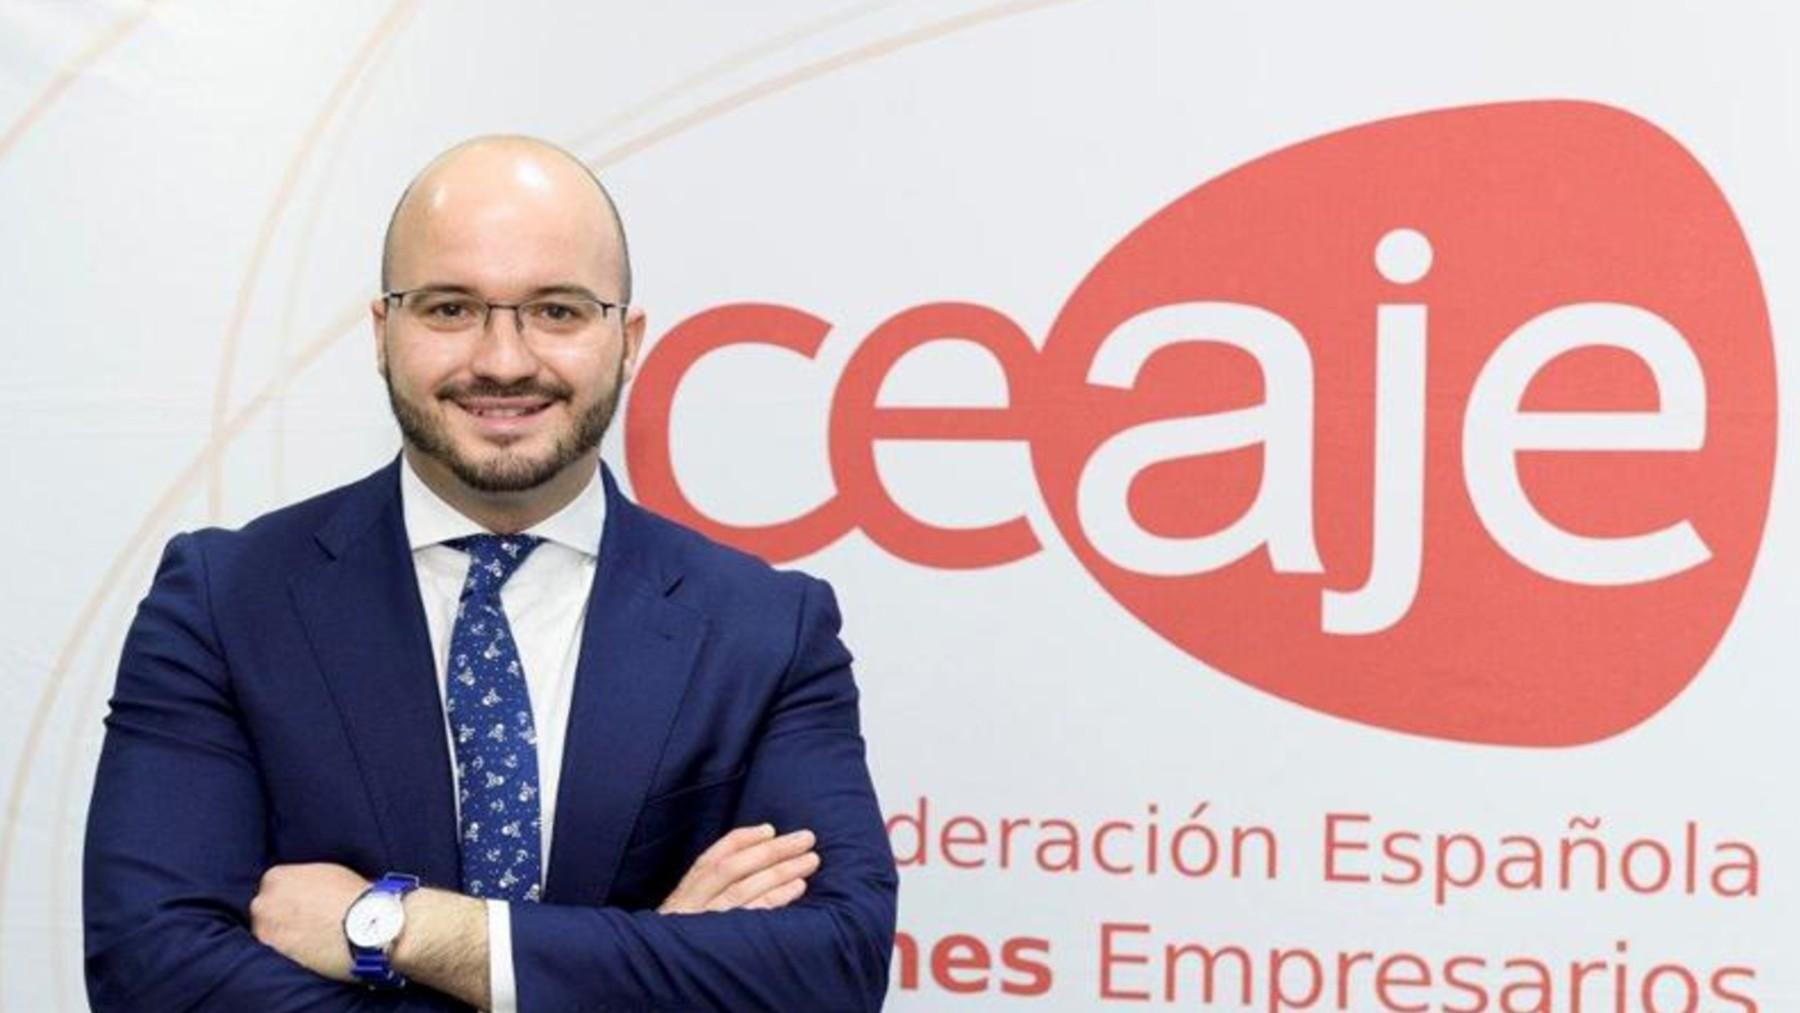 Fermín Albaladejo, Presidente de CEAJE